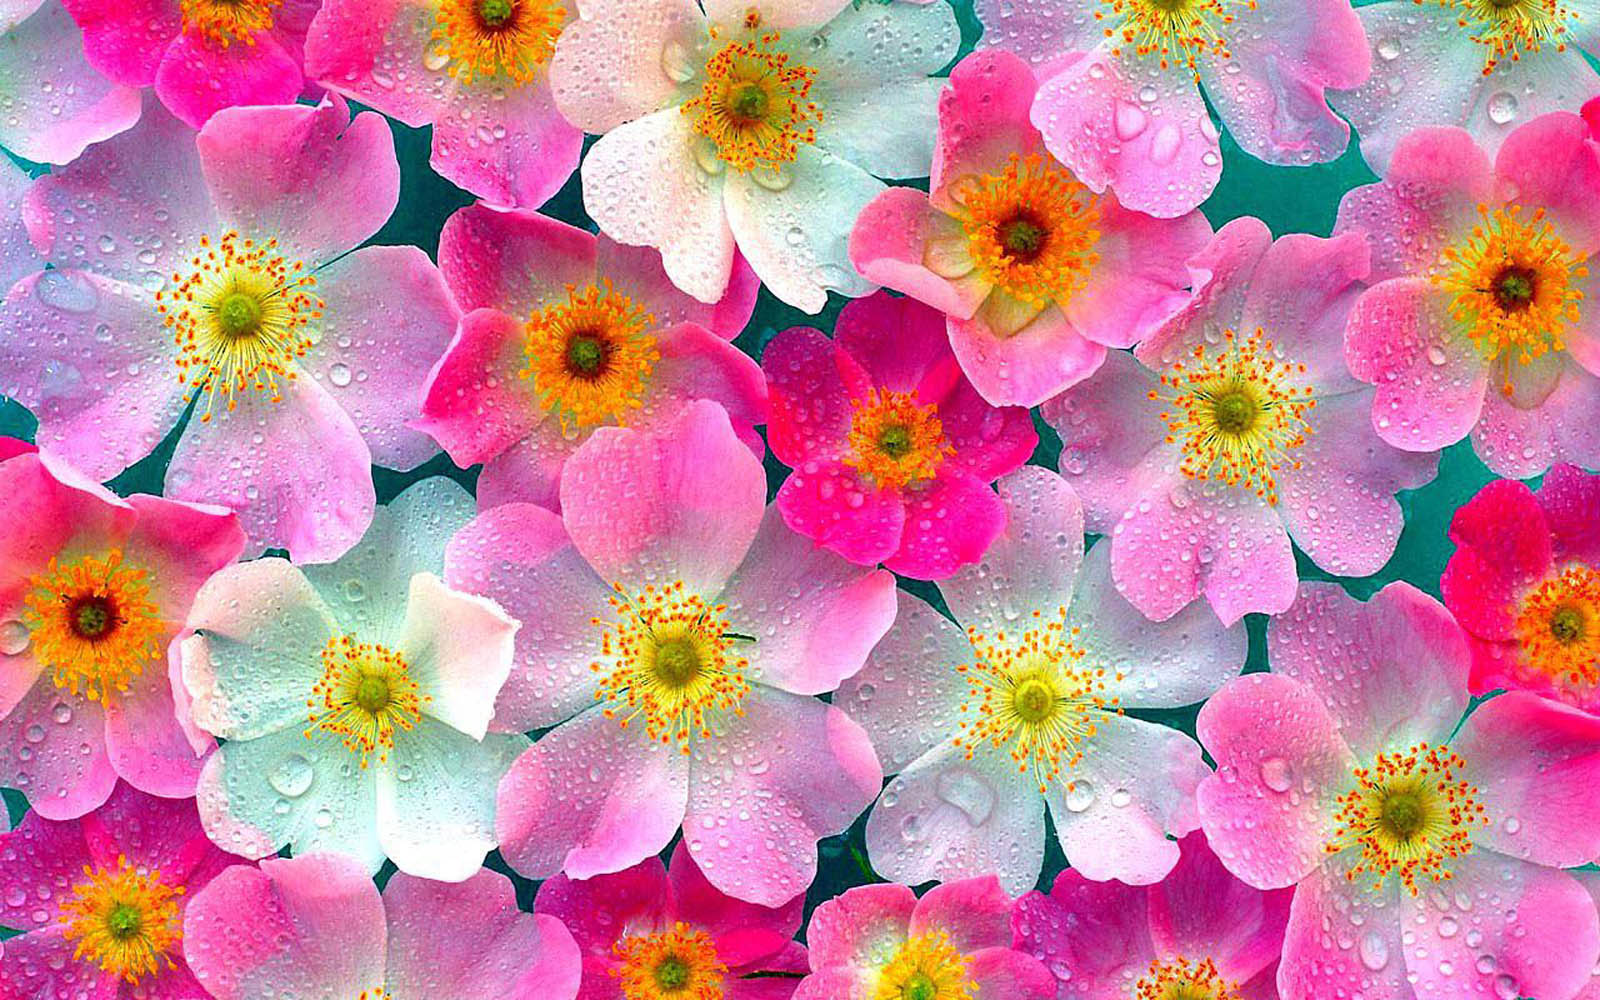 Description flowers pink wallpaper is a hi res wallpaper for pc